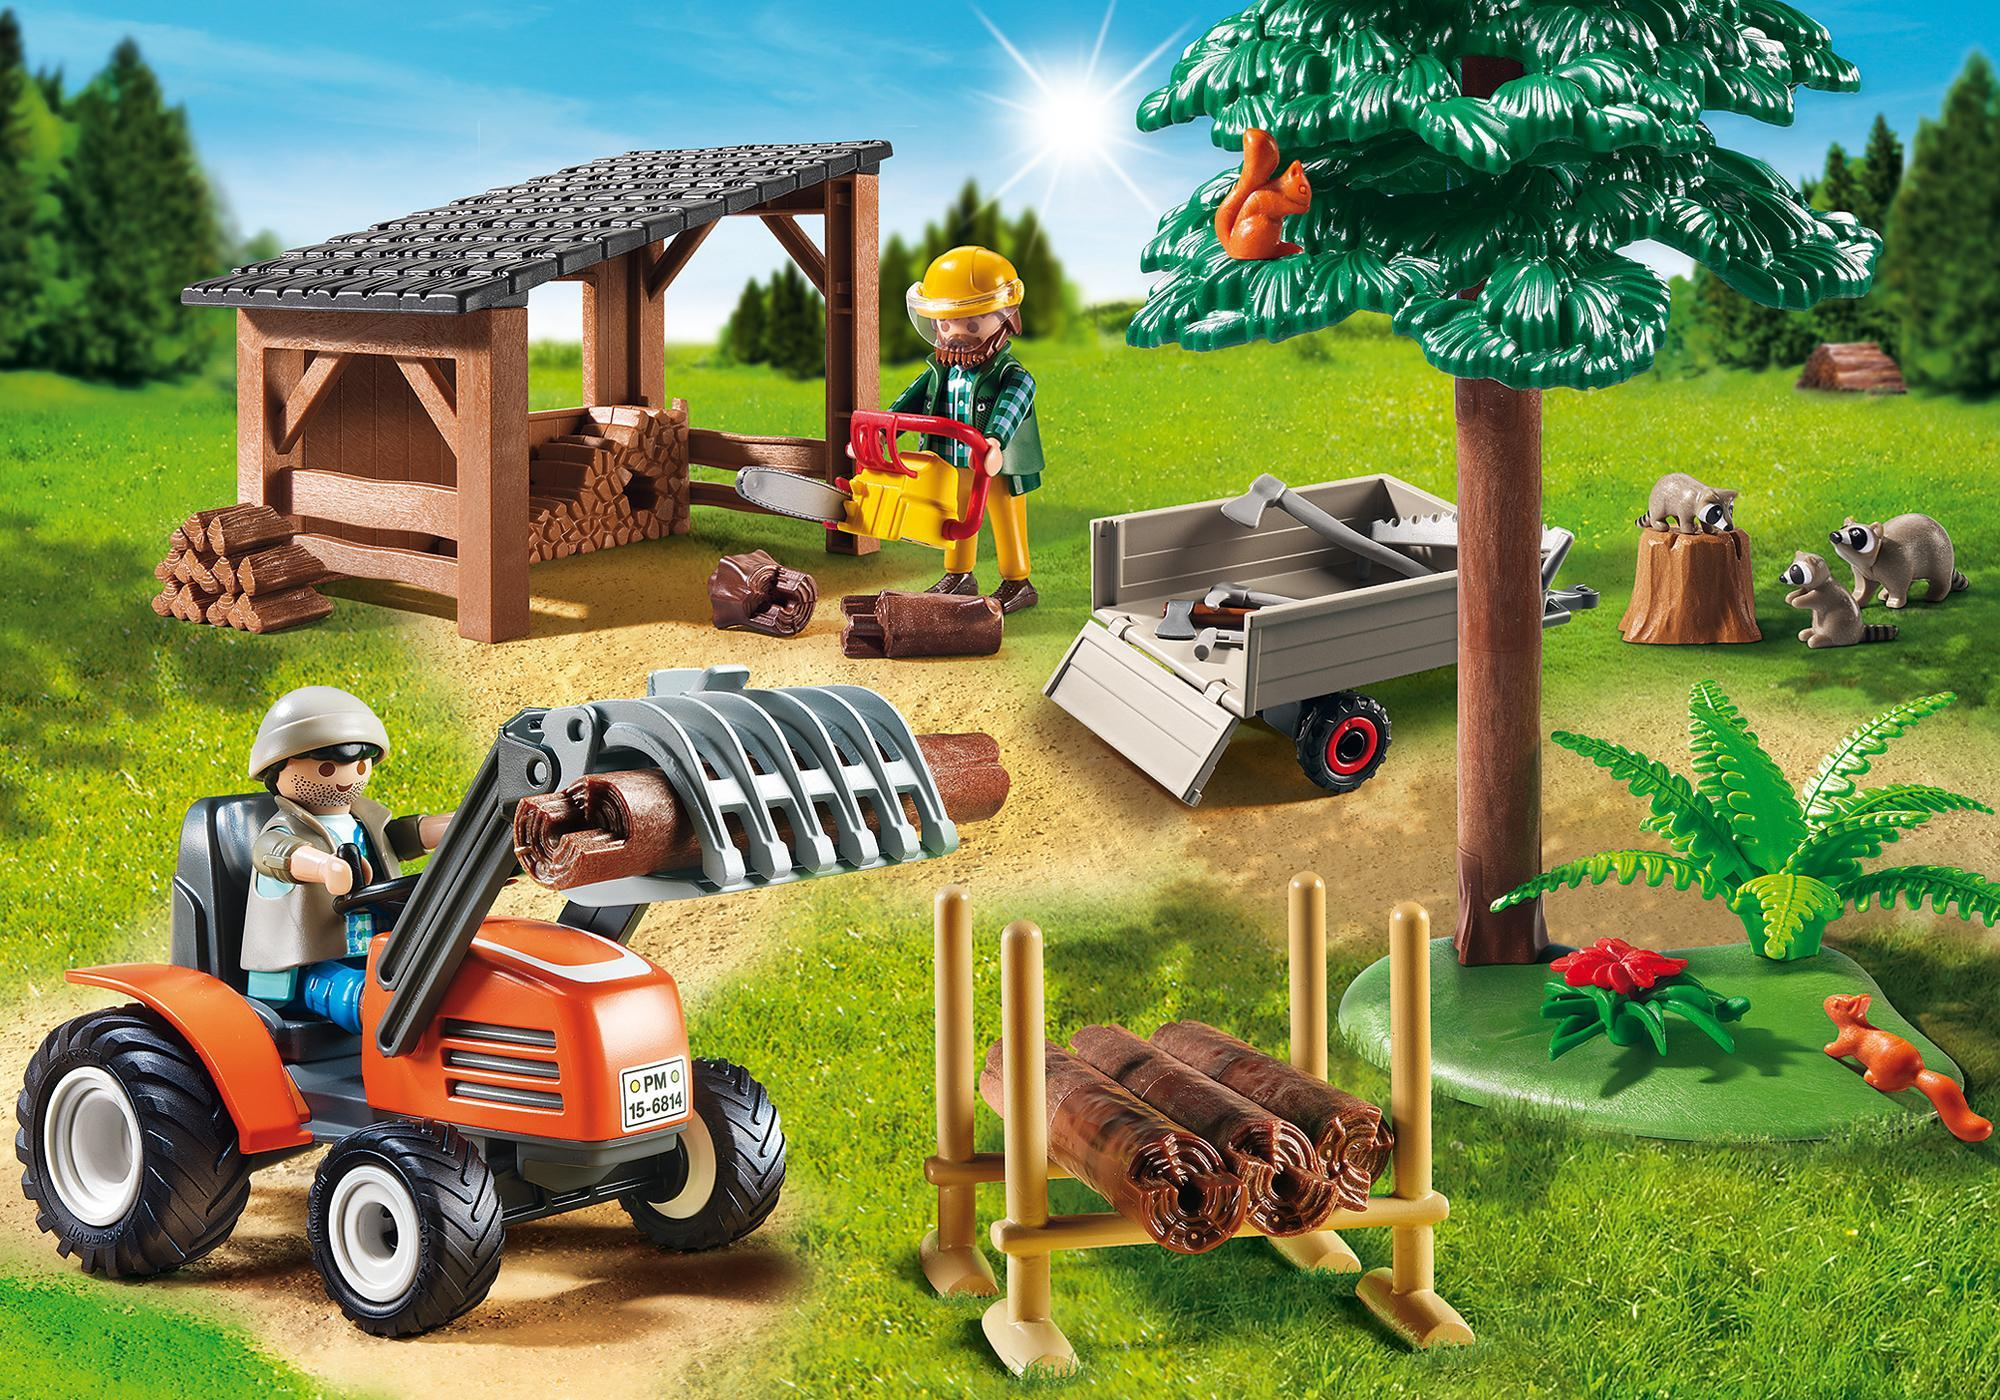 http://media.playmobil.com/i/playmobil/6814_product_detail/Holzfäller mit Traktor